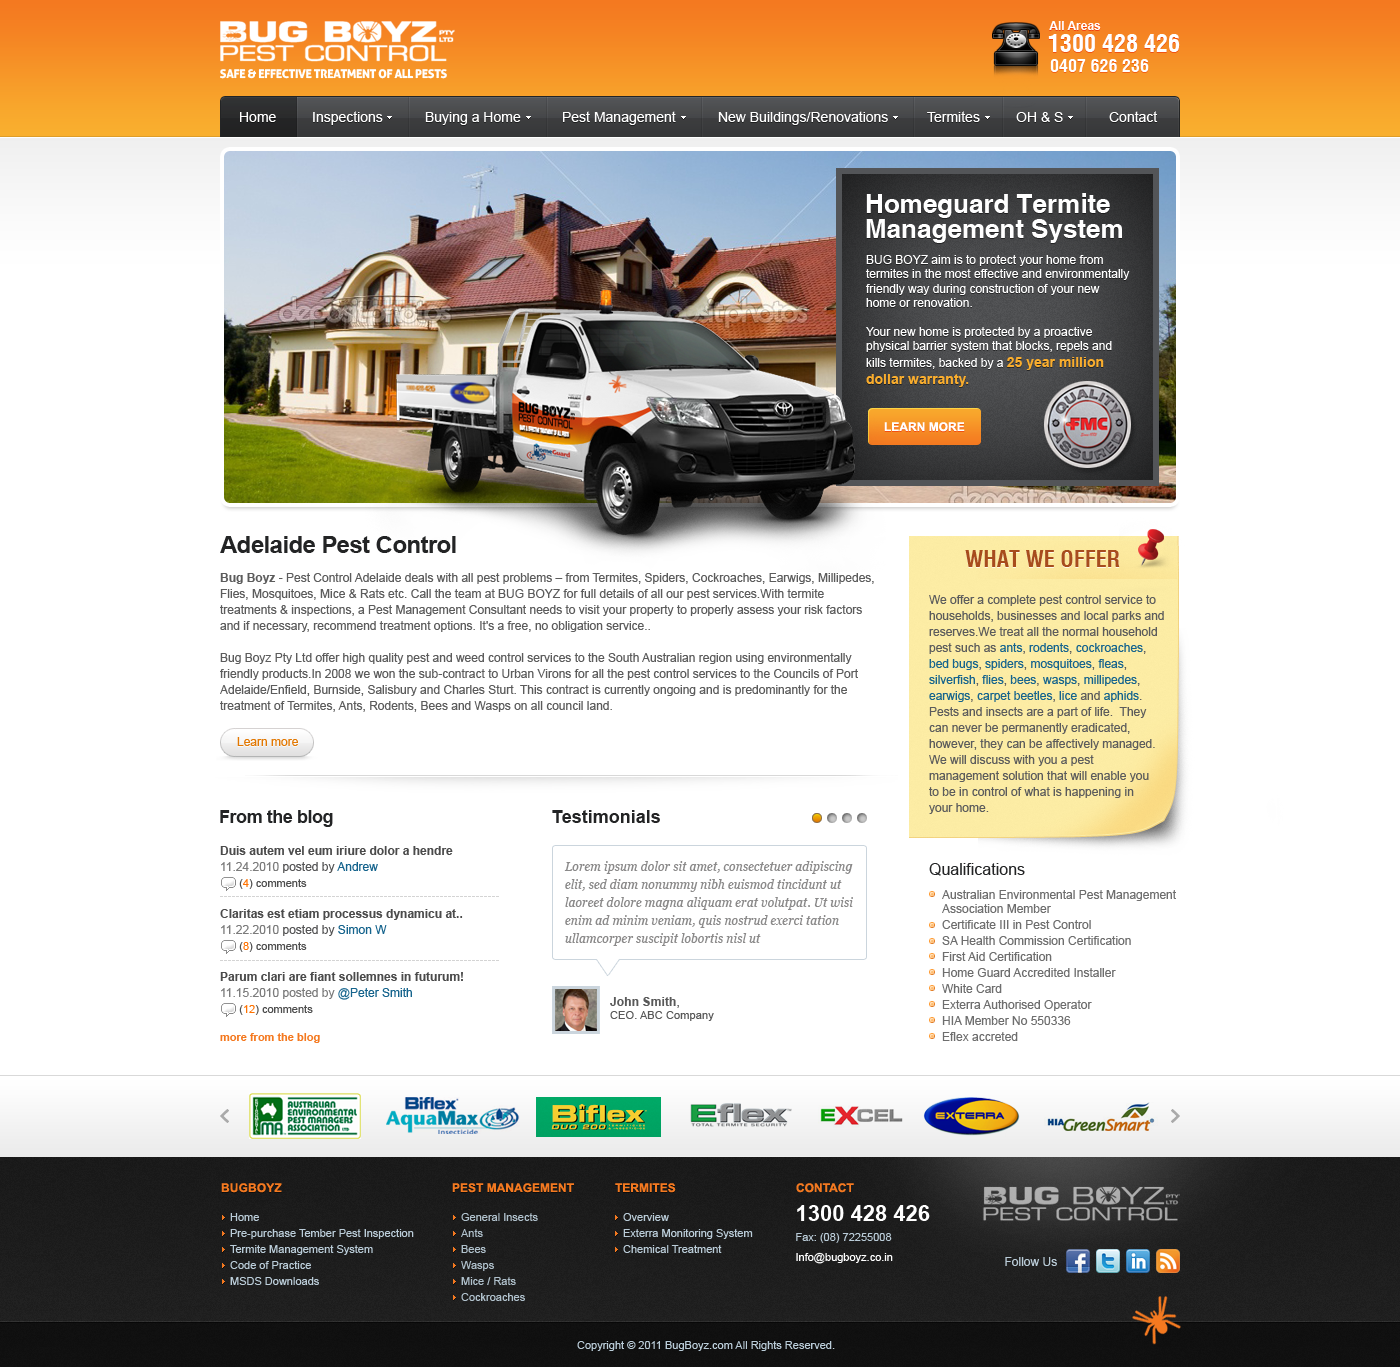 Help Bug Boyz with a killer new web design